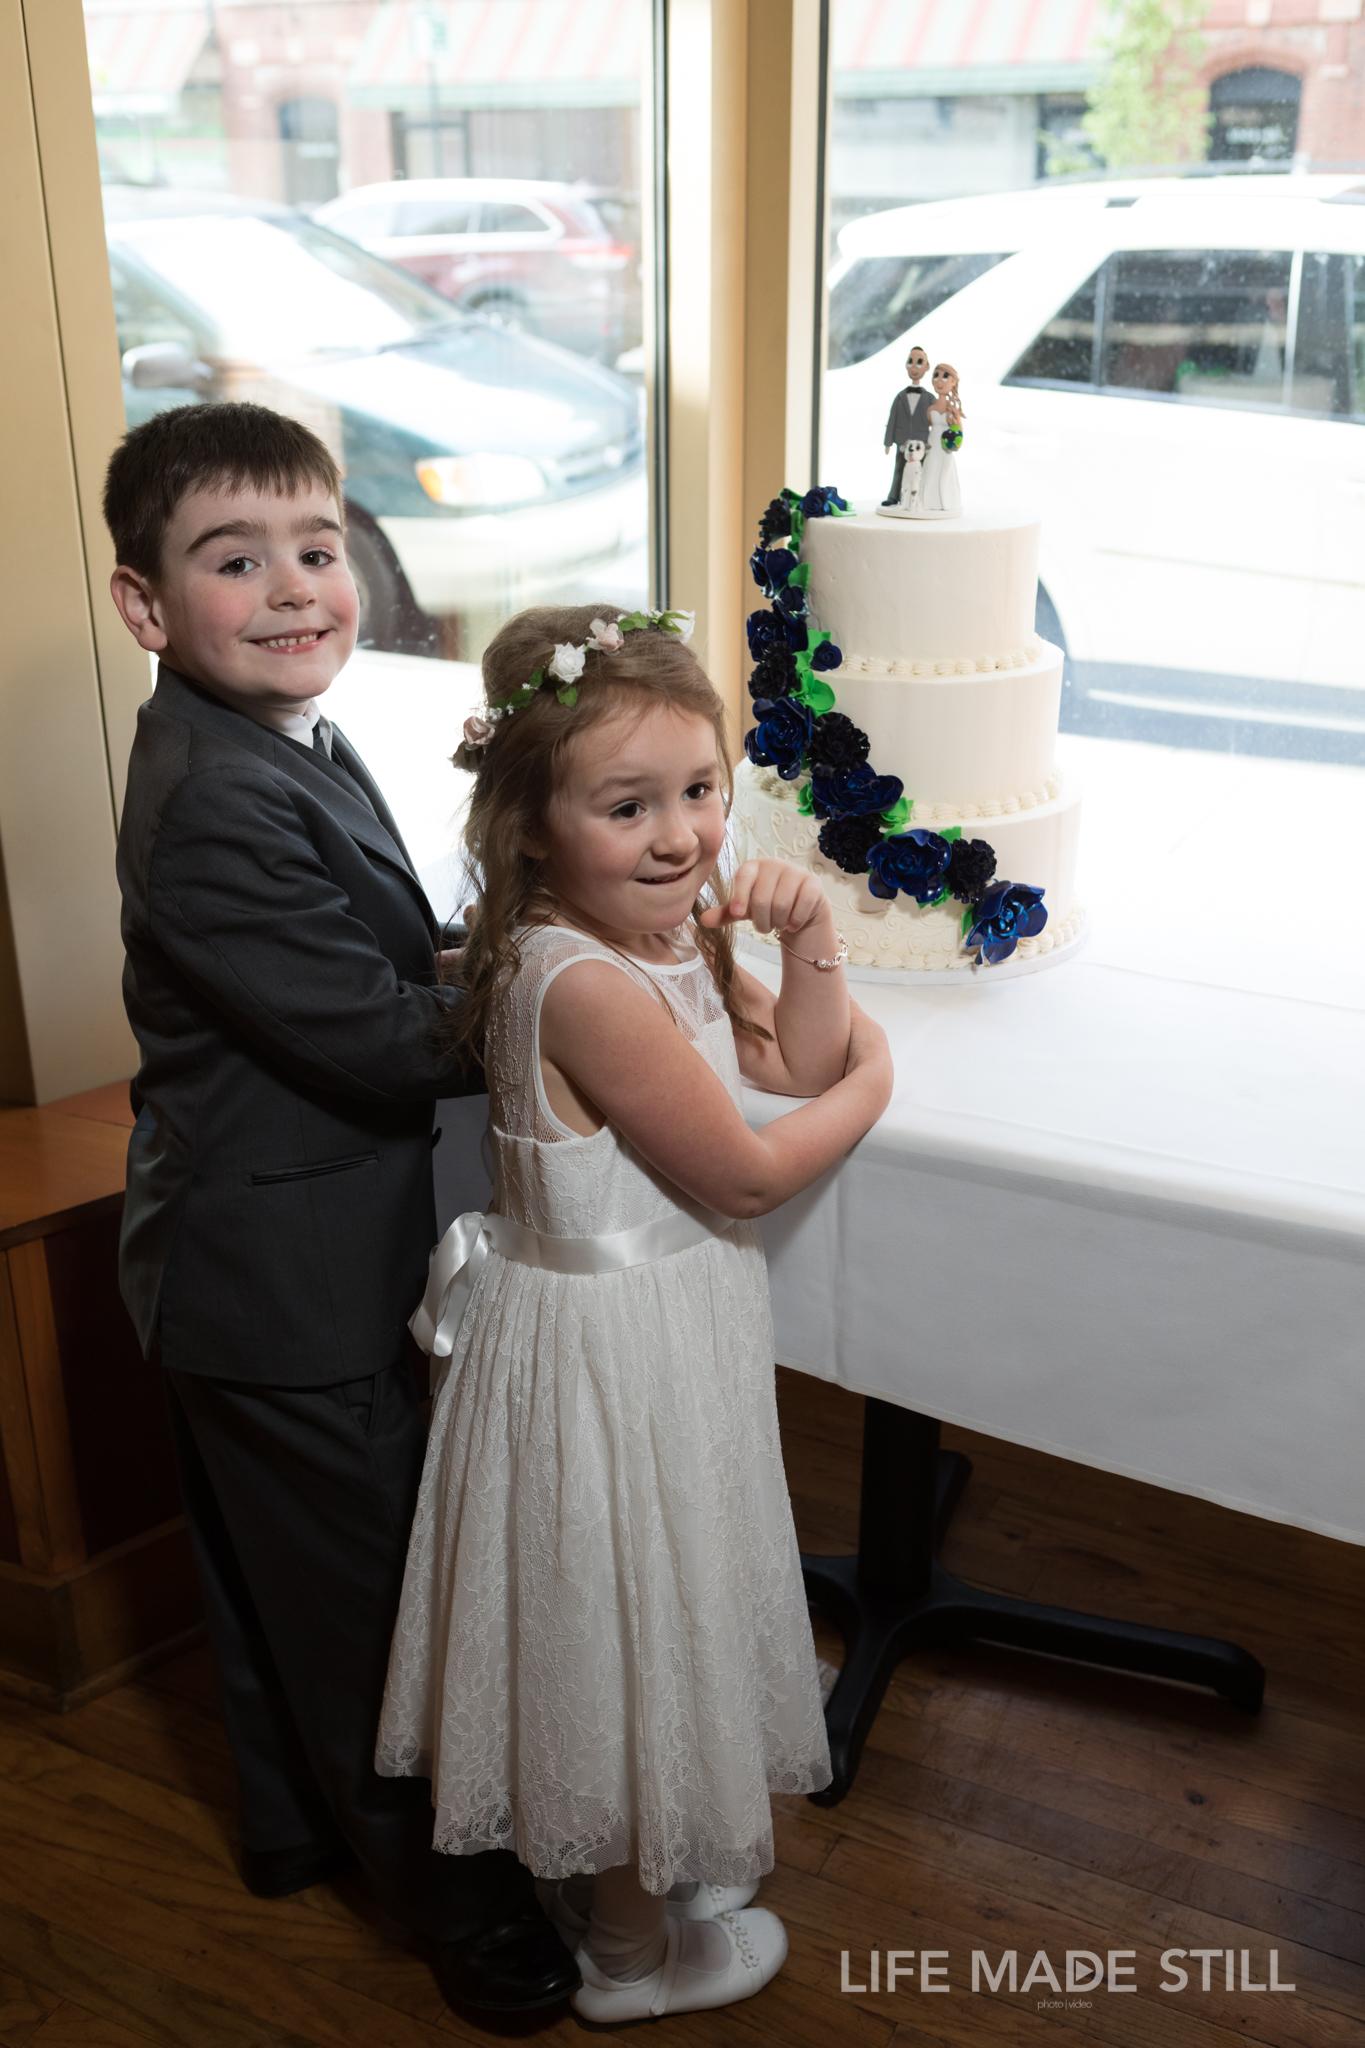 373_633_Angela and Tony_2048px_lifemadestill.com.jpg